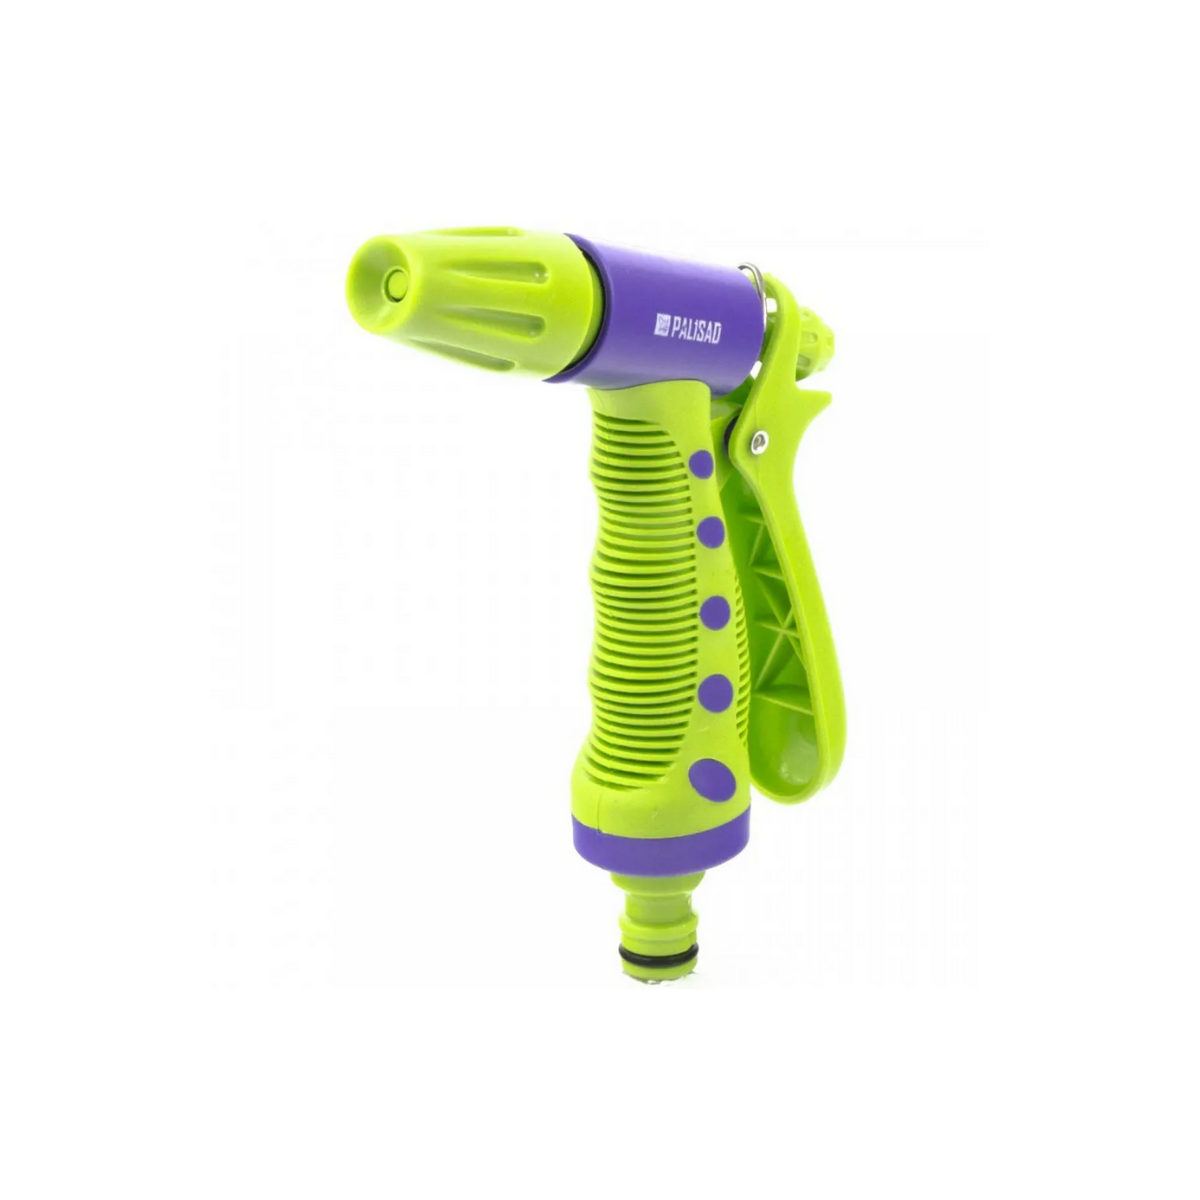 Esguicho Para Mangueira Regulável Tipo Pistola Palisad